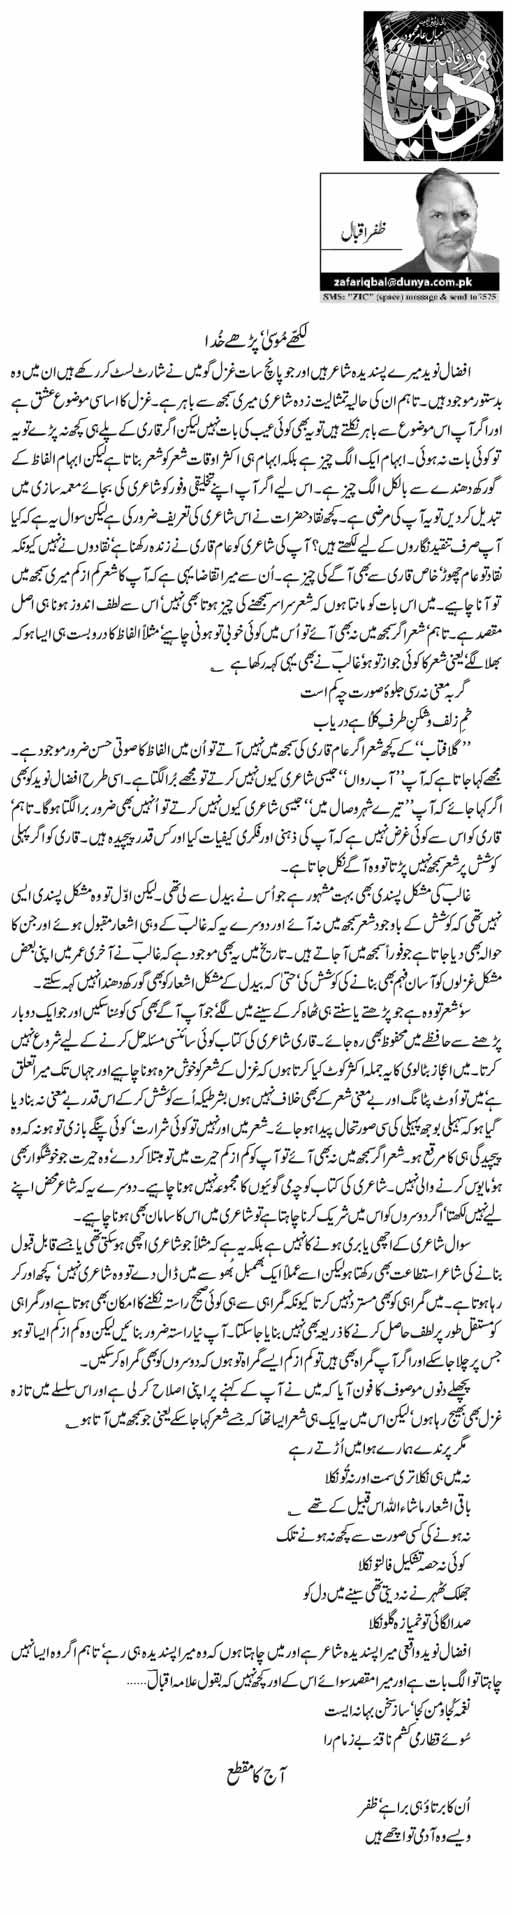 Likhay Moosa, Parhay Khuda | Zafar Iqbal | Daily Urdu Columns